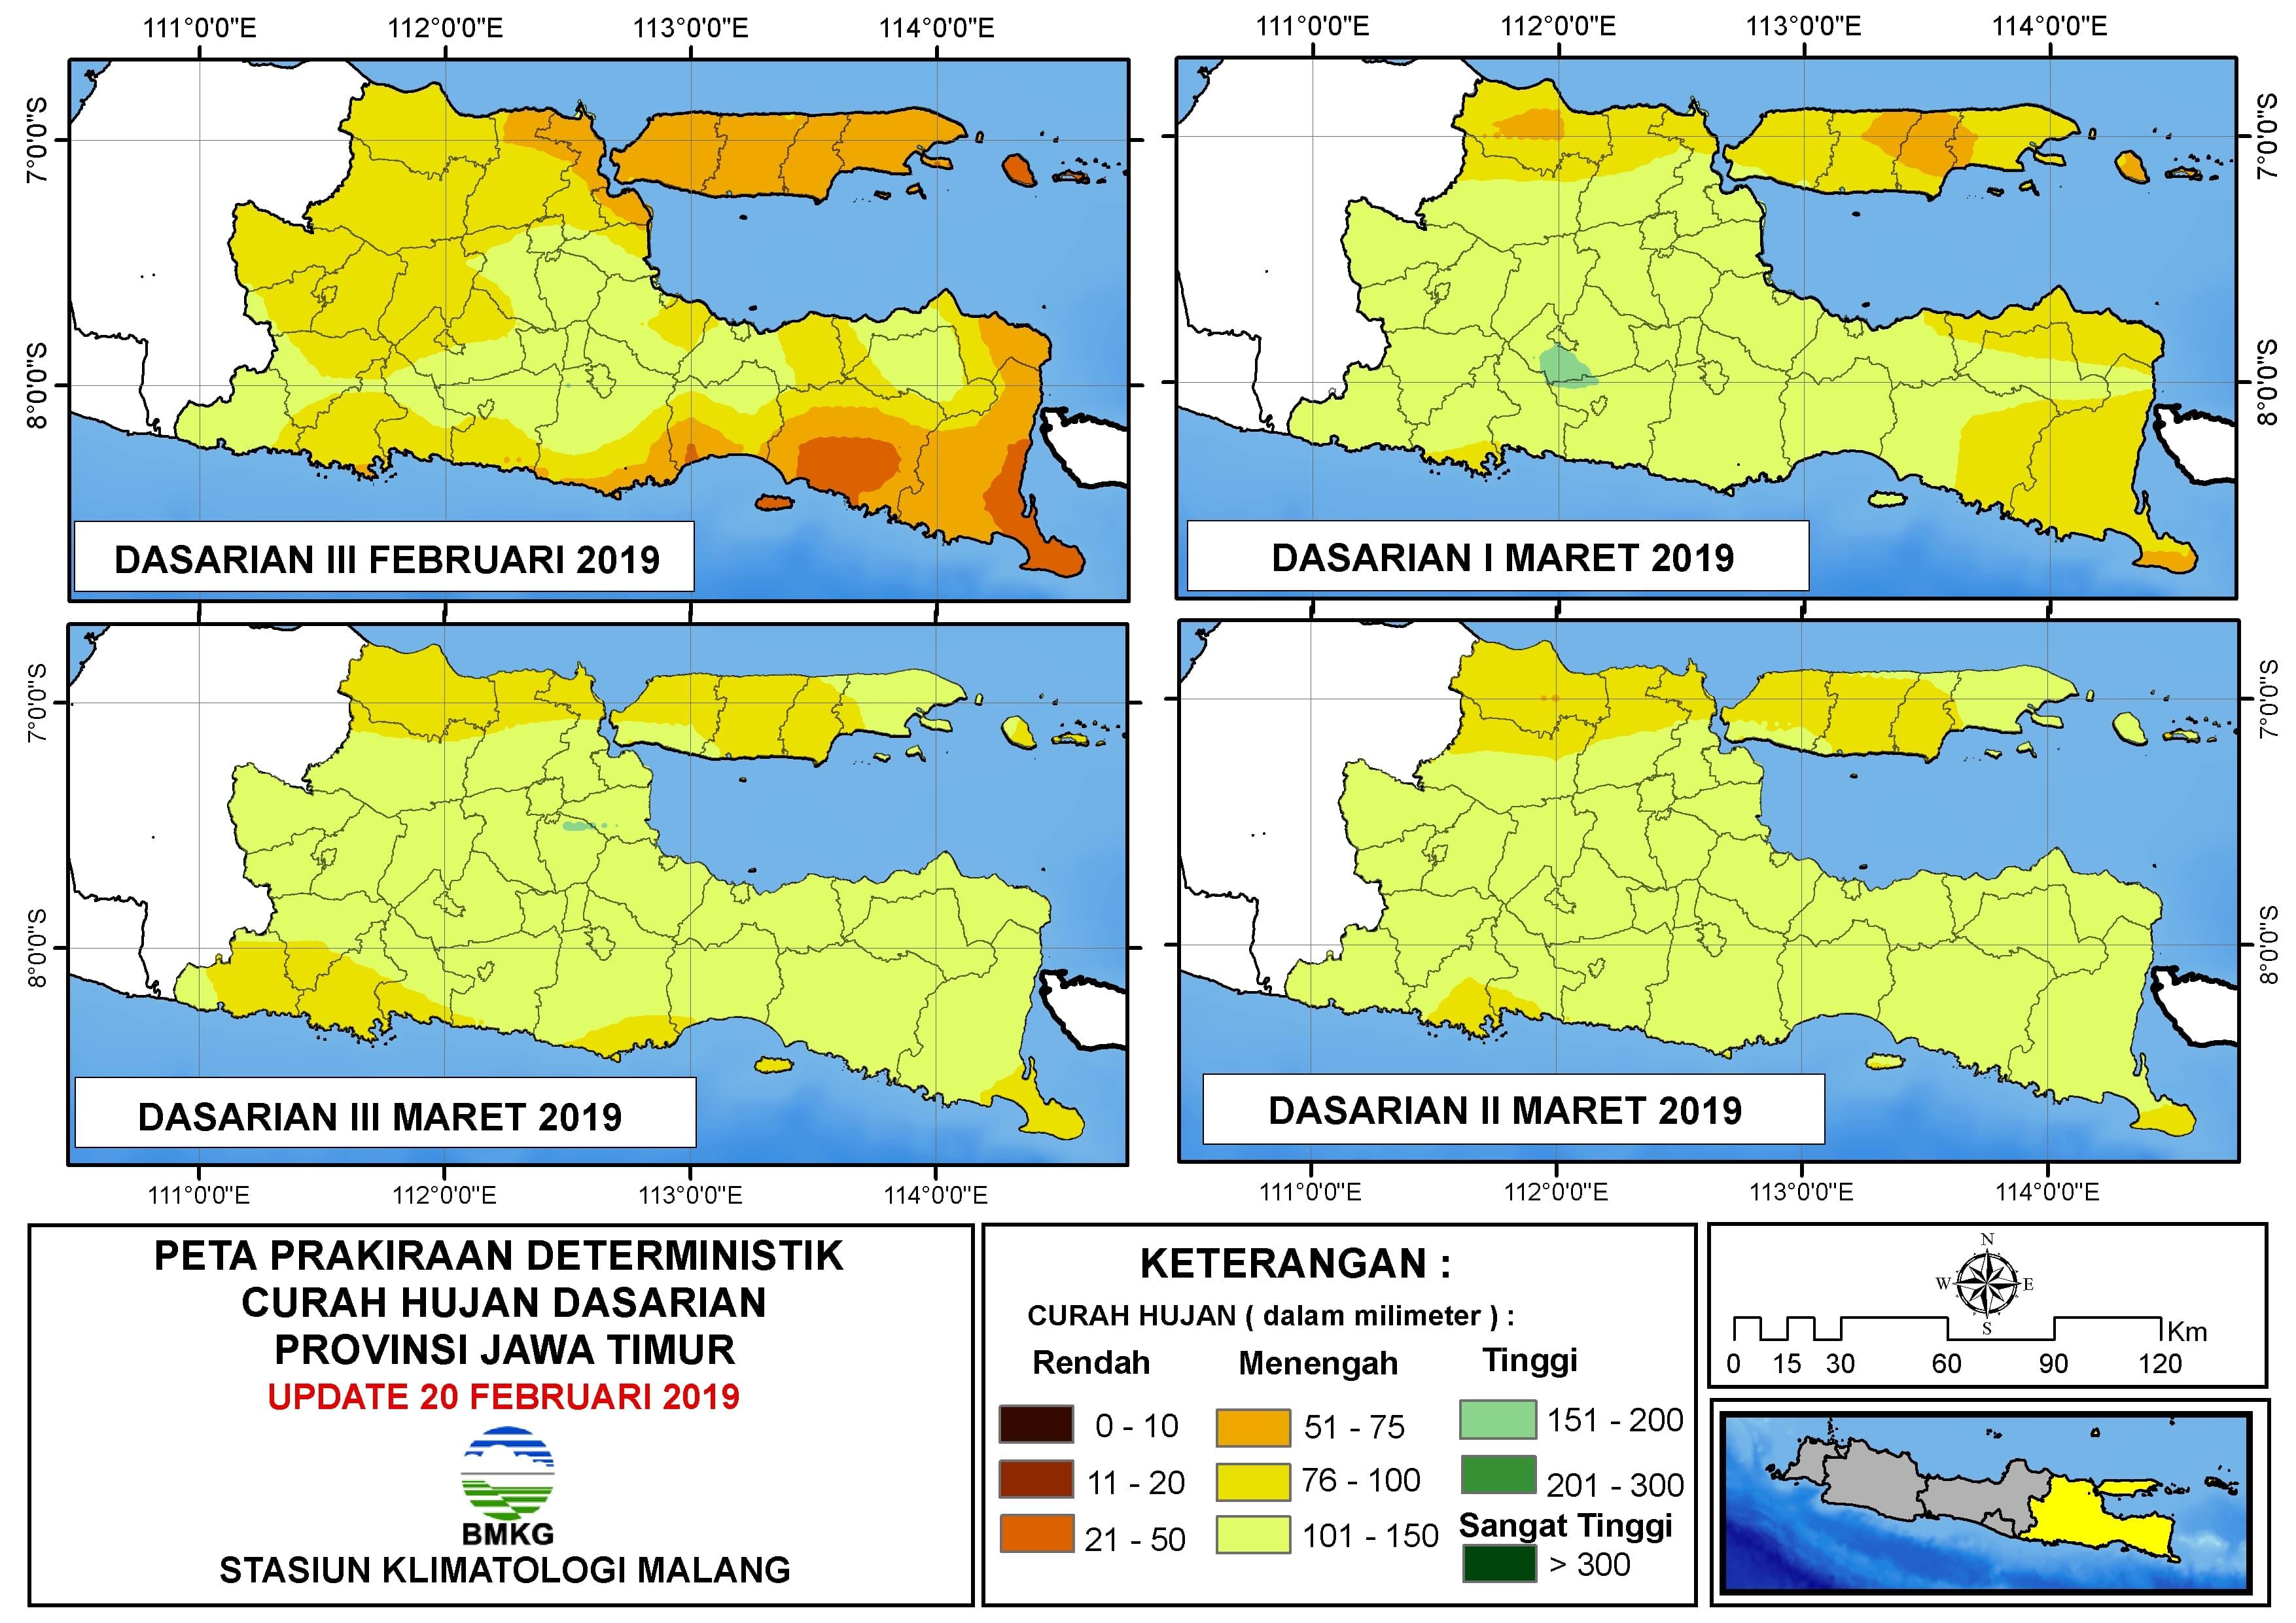 Peta Prakiraan Deterministik Curah Hujan Dasarian Provinsi Jawa Timur Update 20 Februari 2019